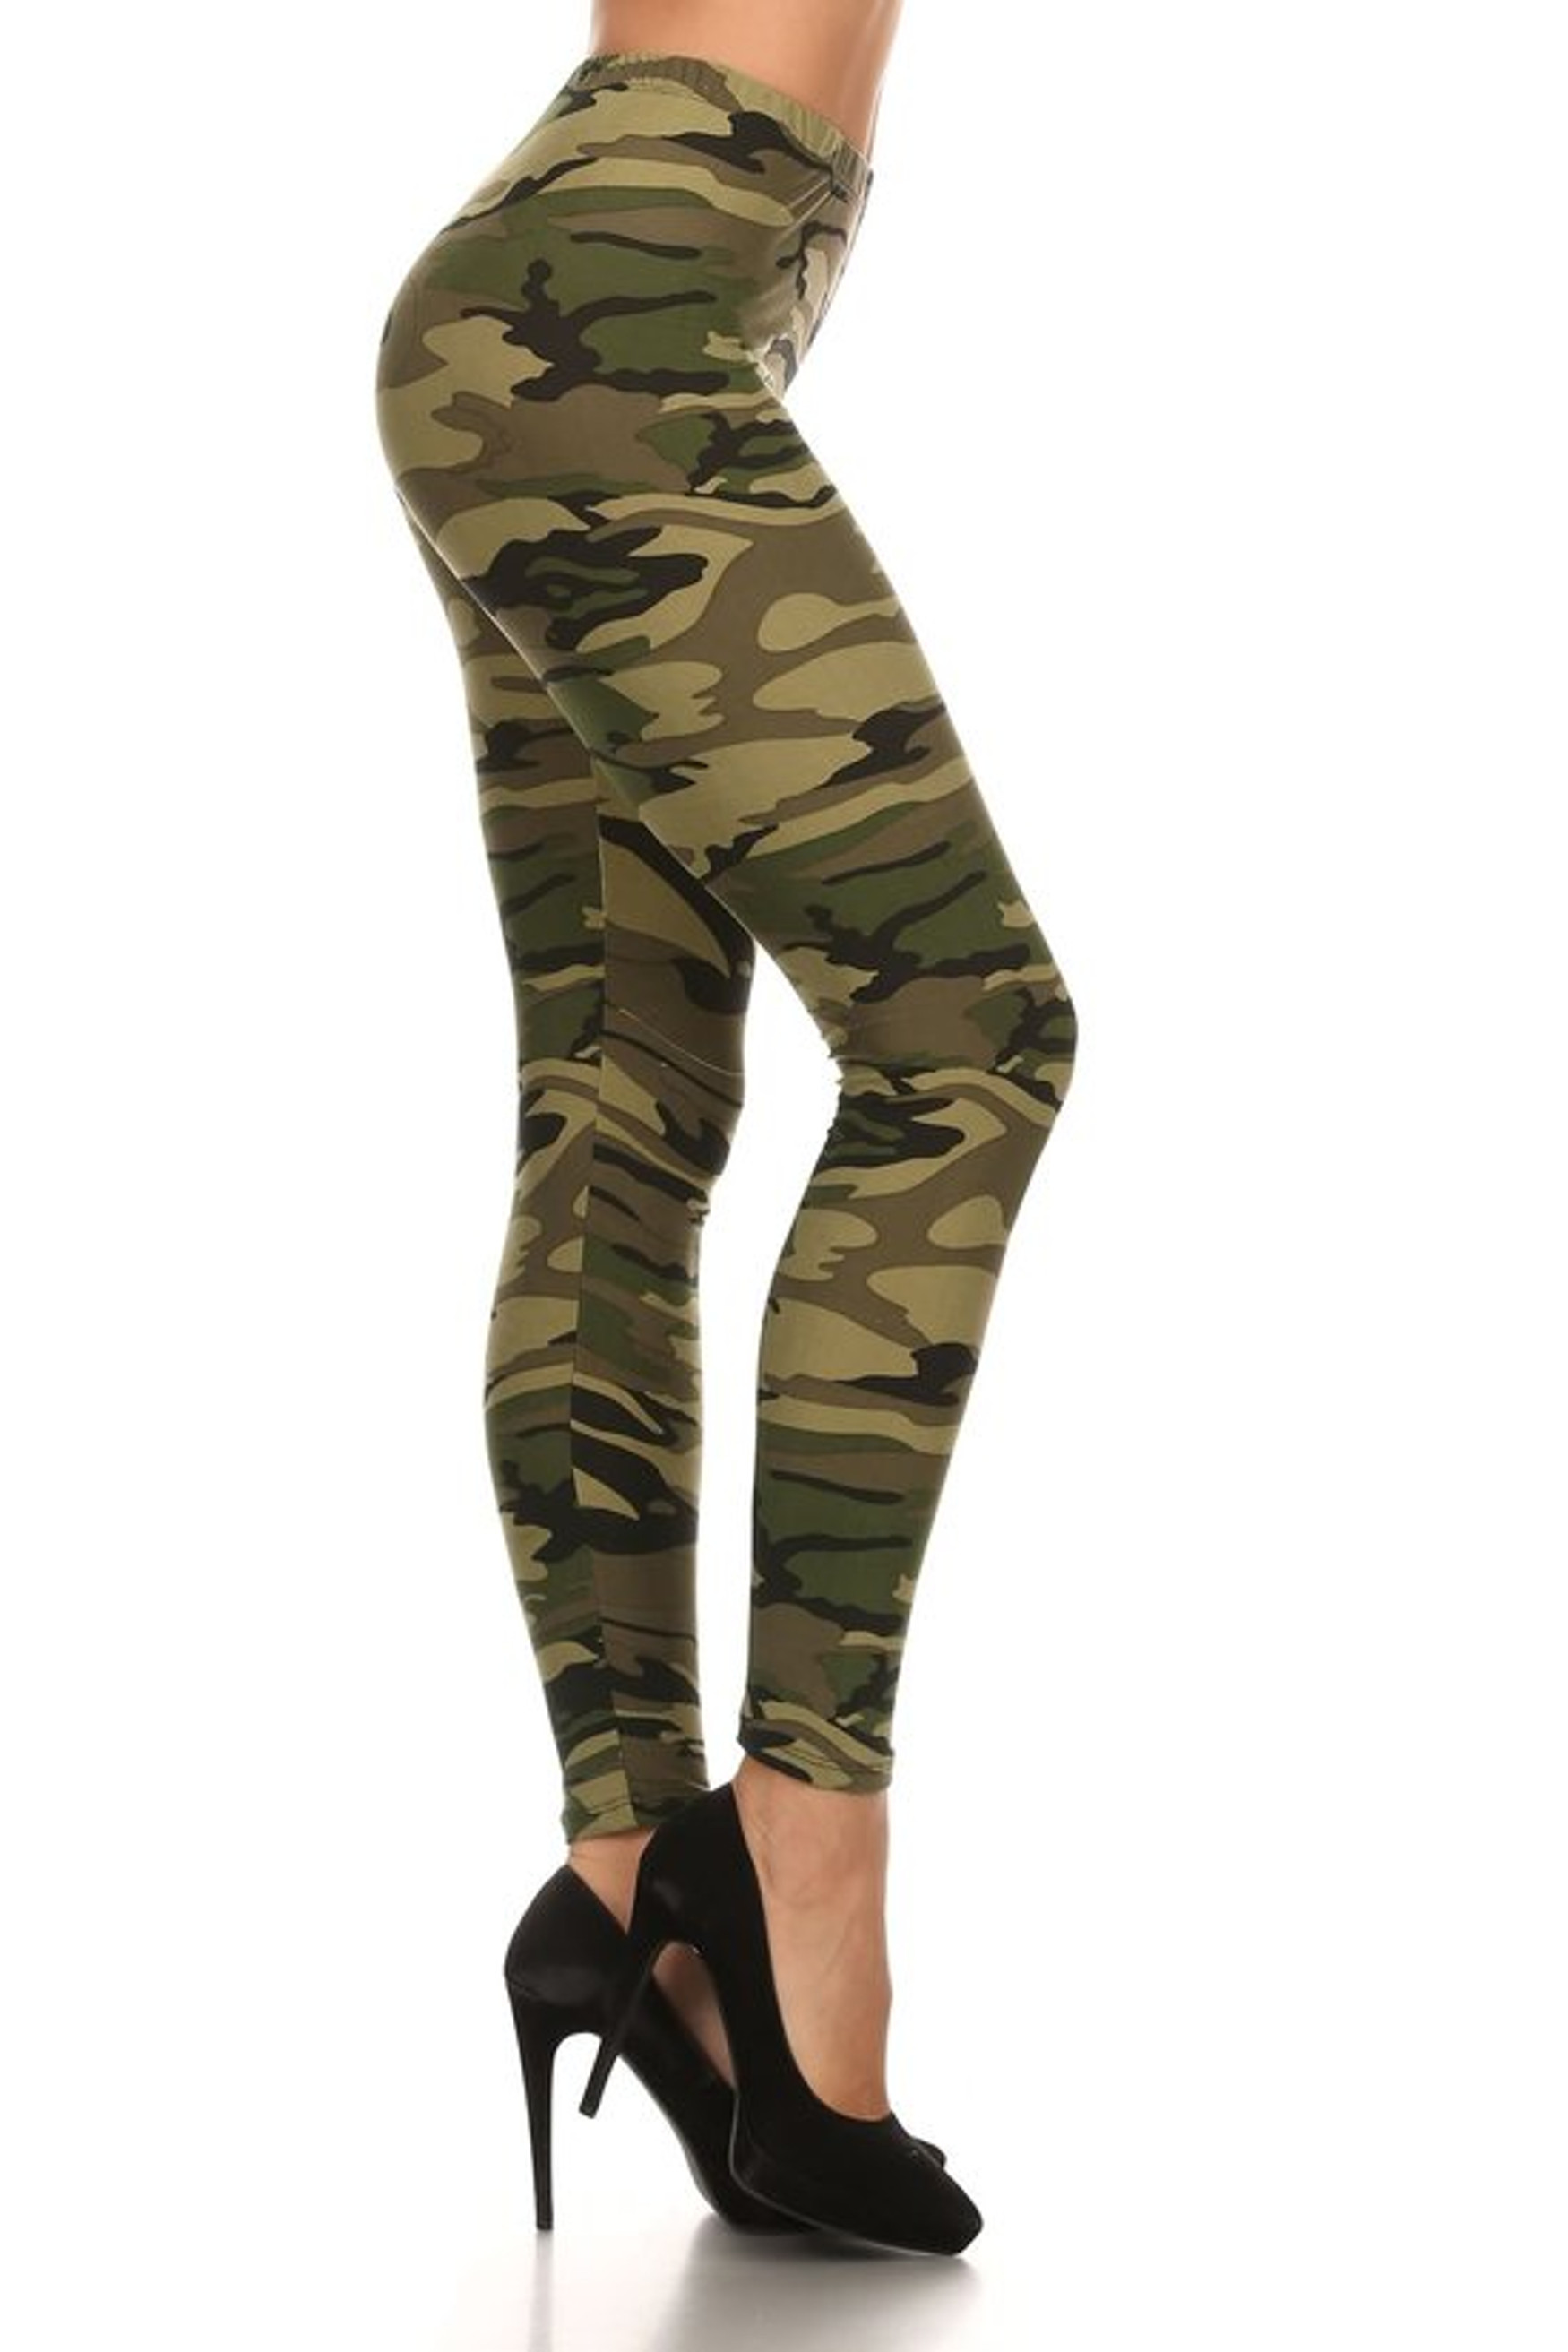 Green Camouflage Leggings